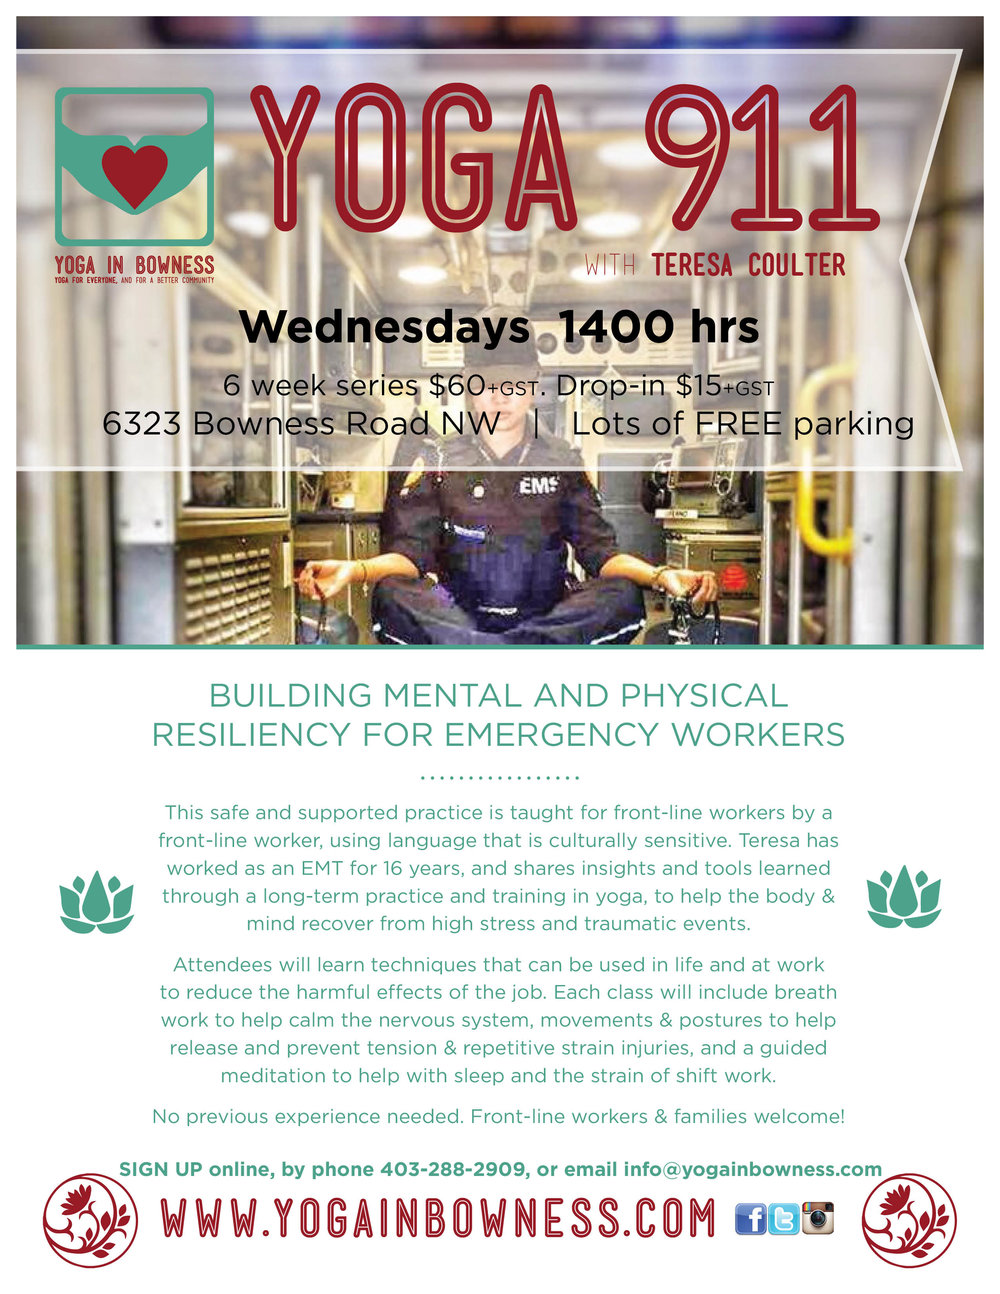 Yoga 911.jpg